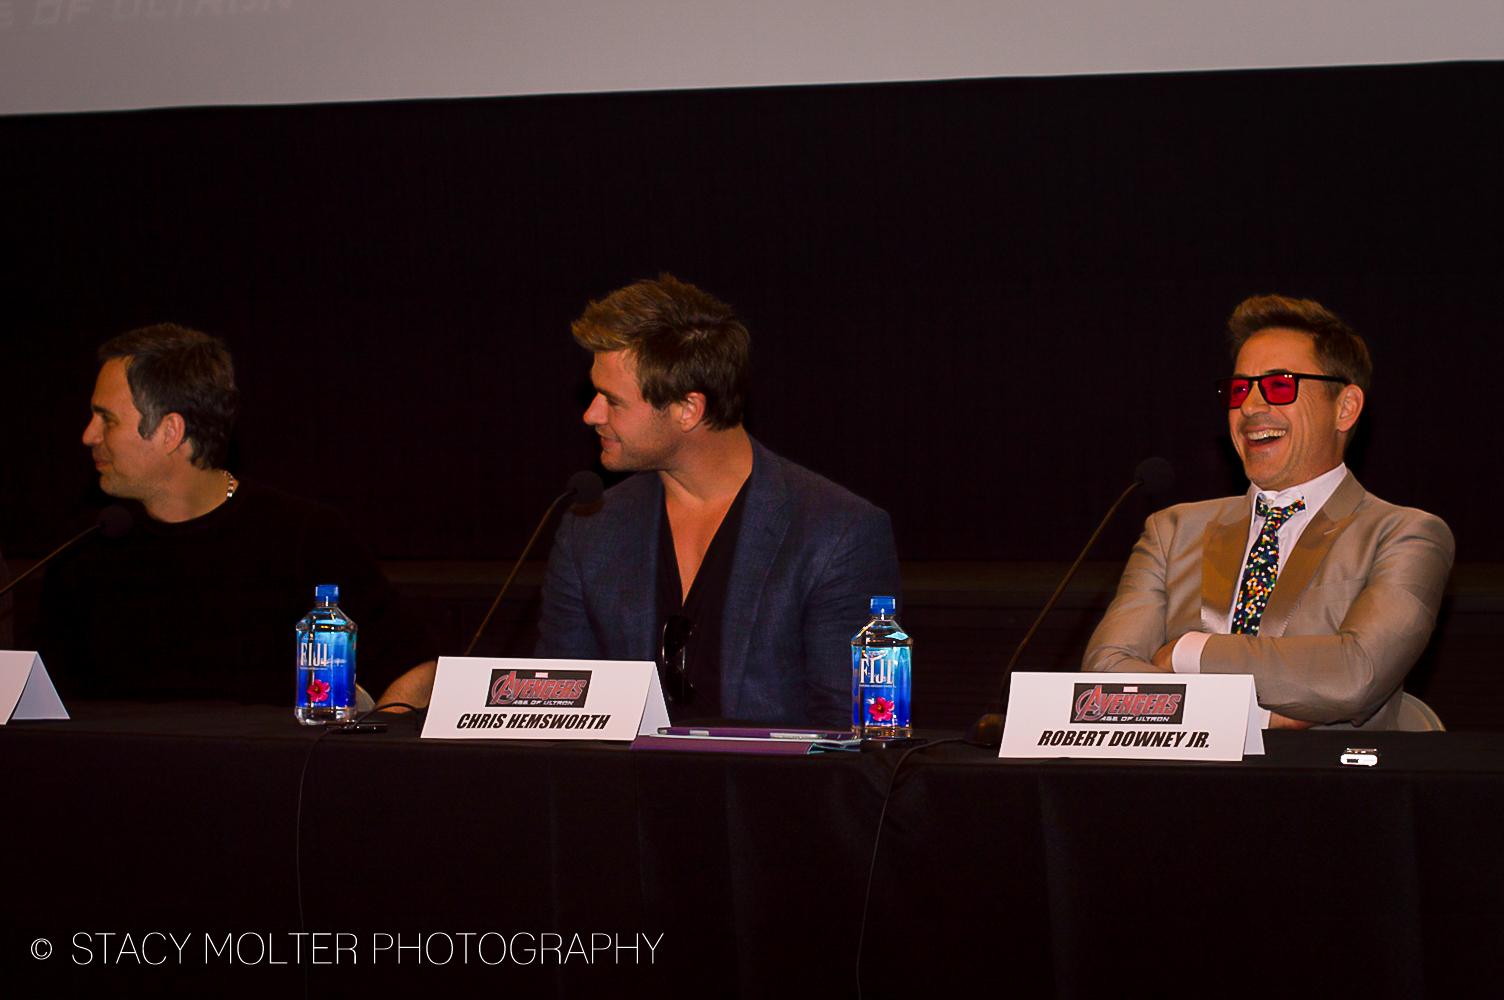 Mark Ruffalo, Chris Hemsworth, Robert Downey Jr. - Avengers Age of Ultron Press Conference Junket